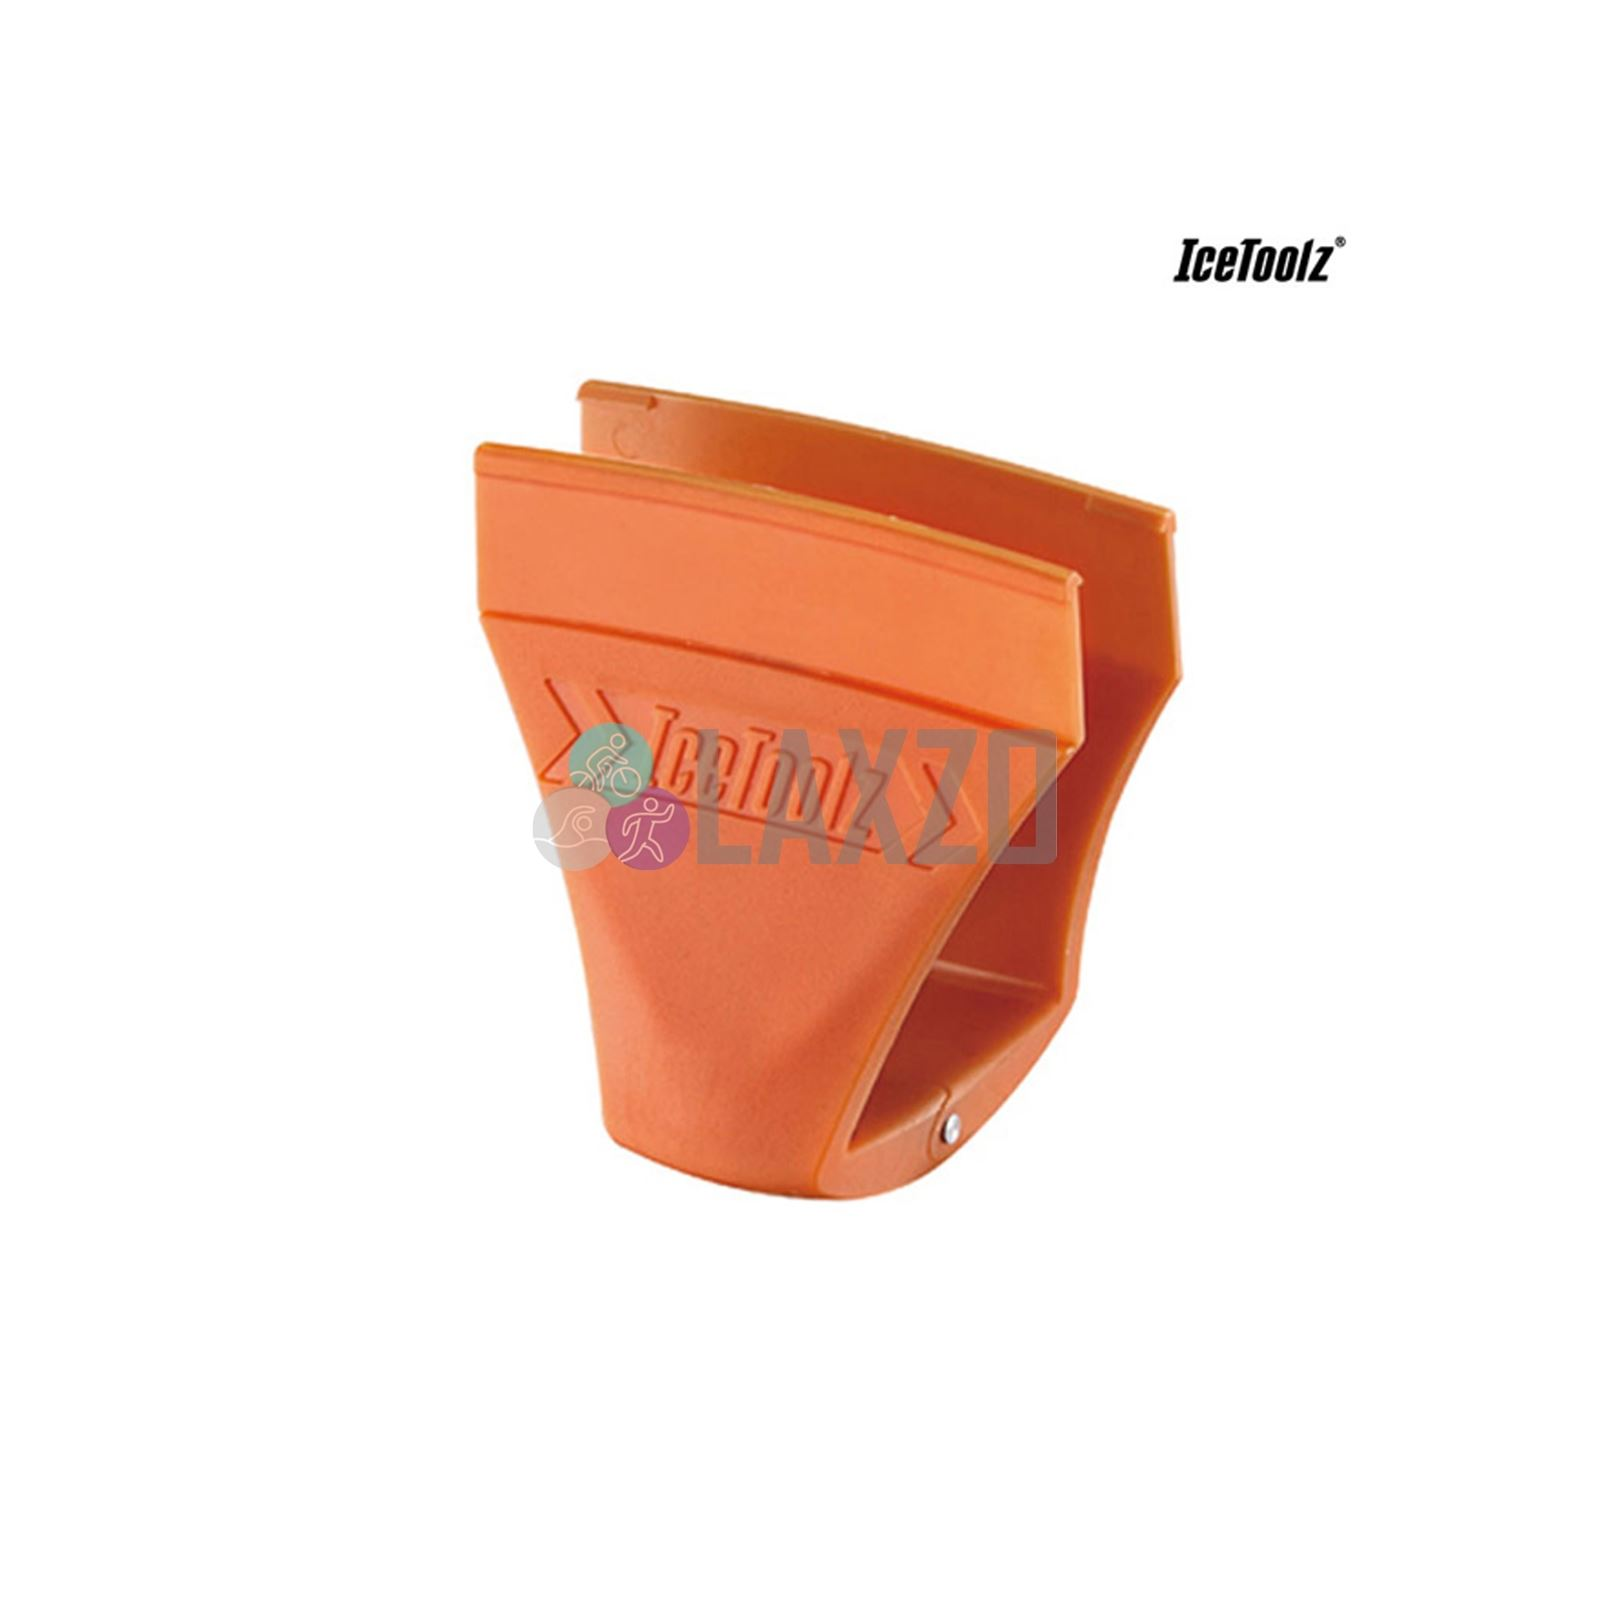 Plastic 1 Piece IceToolz Croco Brake Shoe Tuner Bicycle Adjustable Orange